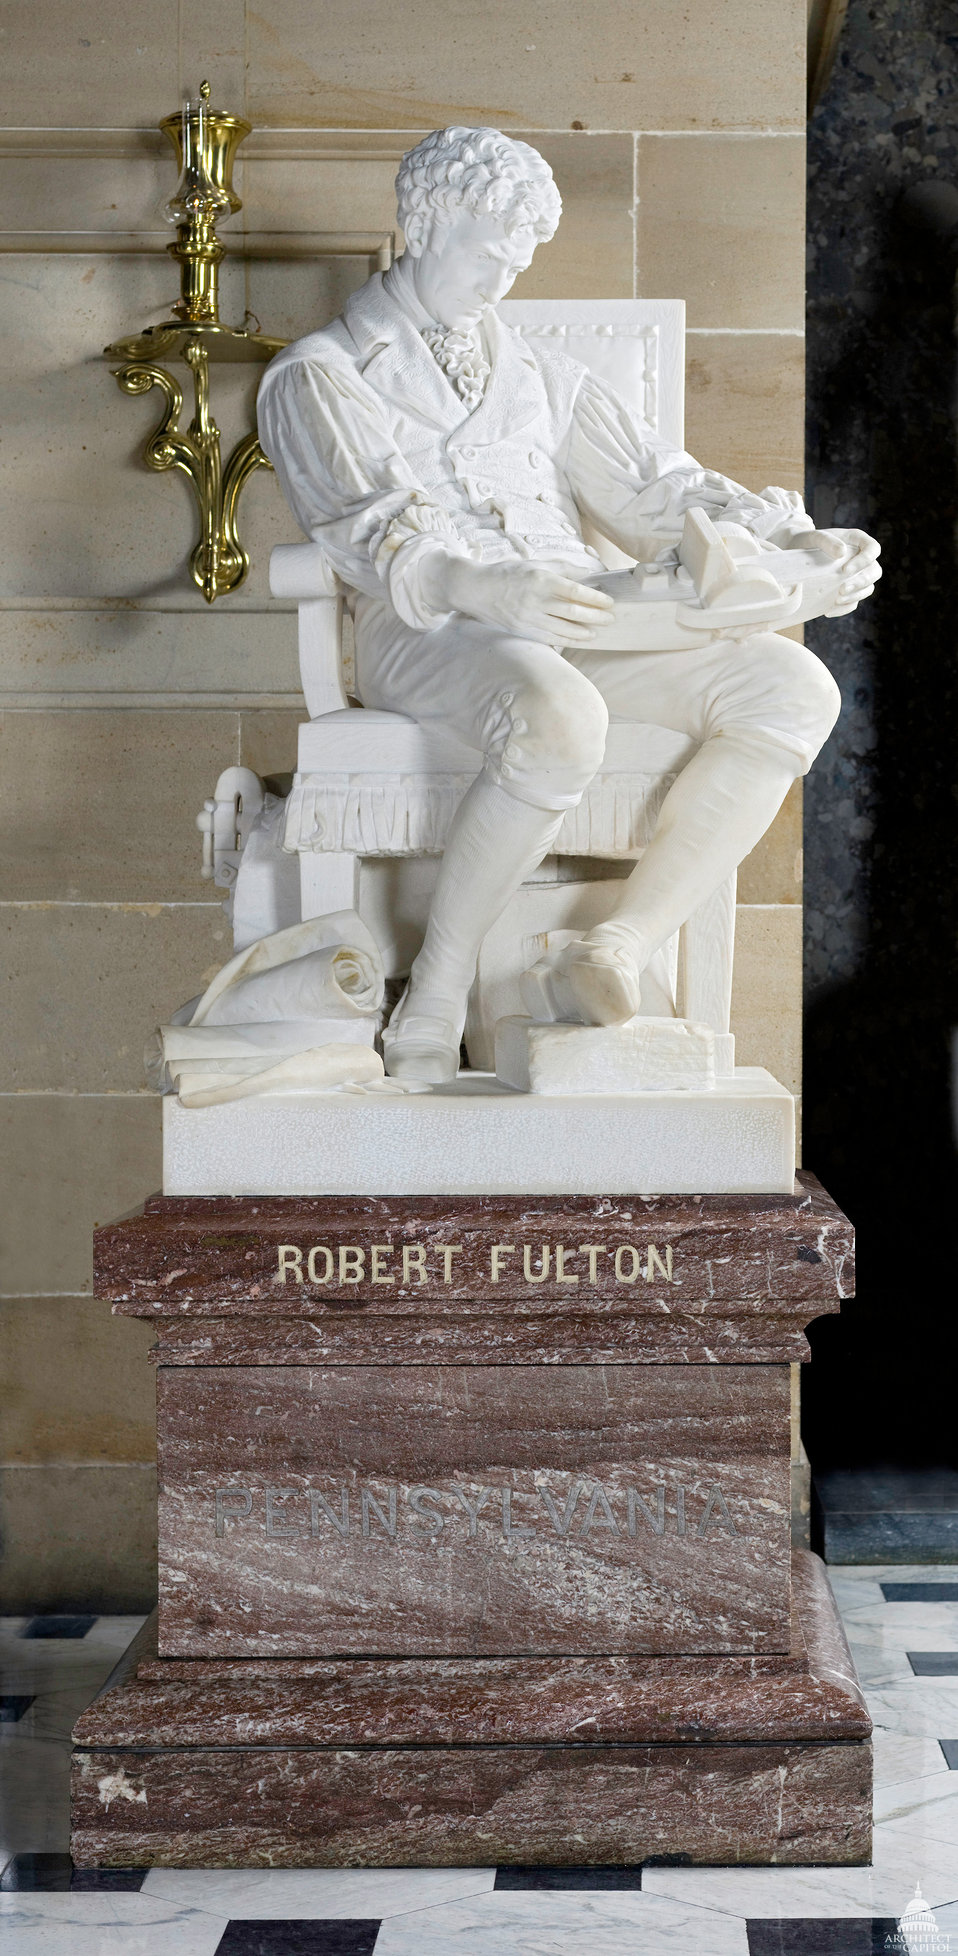 Robert Fulton Statue